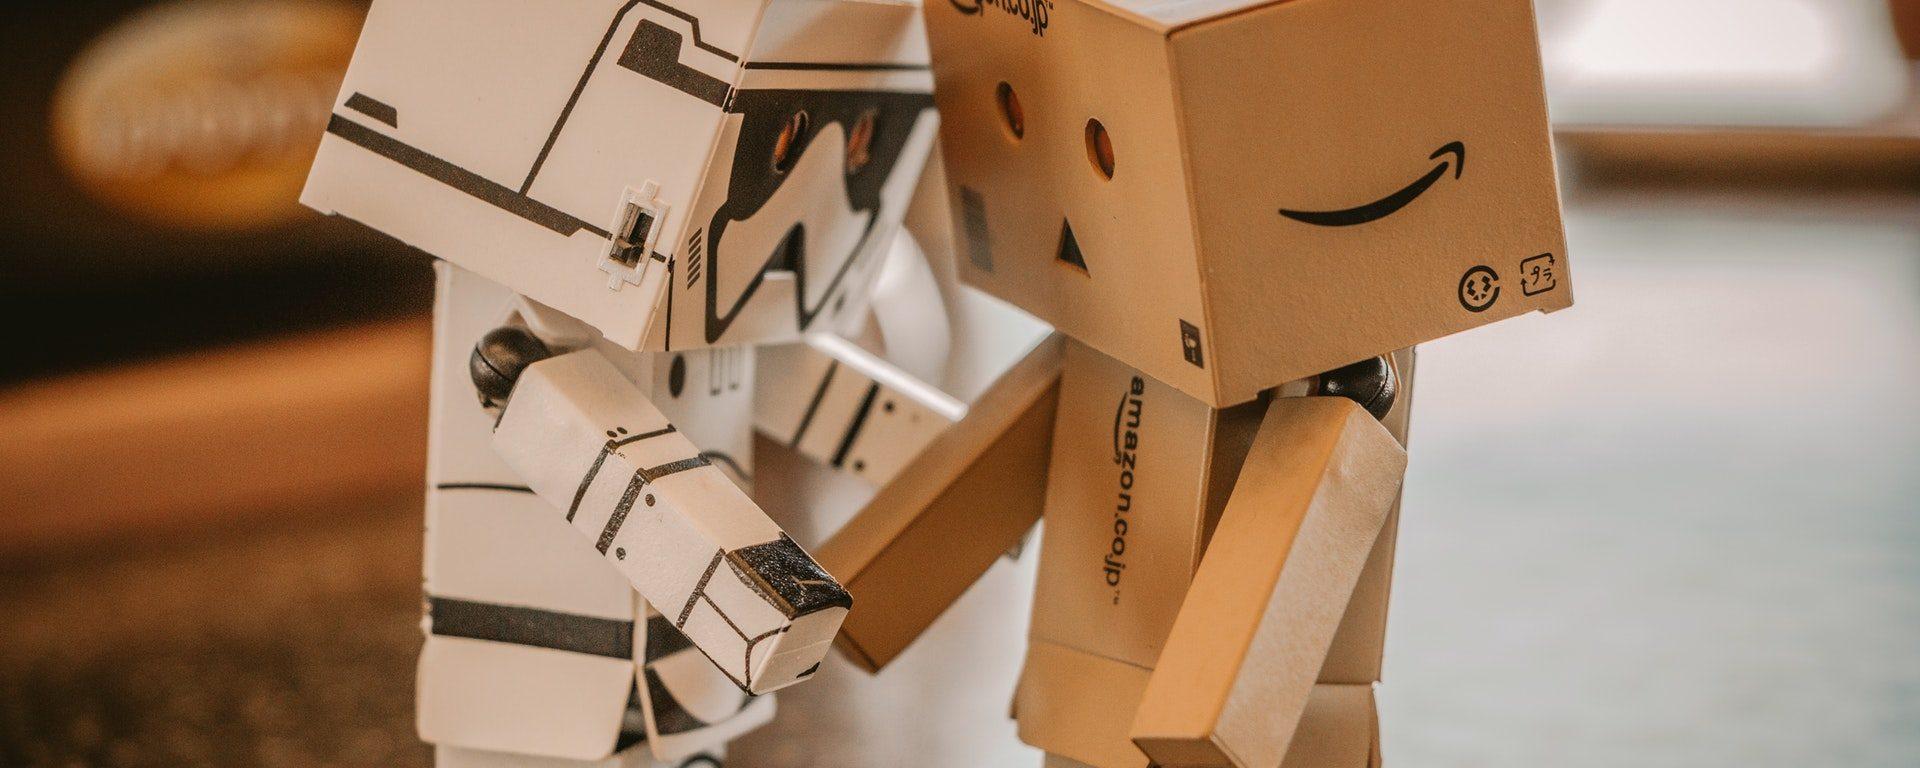 Chatbot Digital Automation